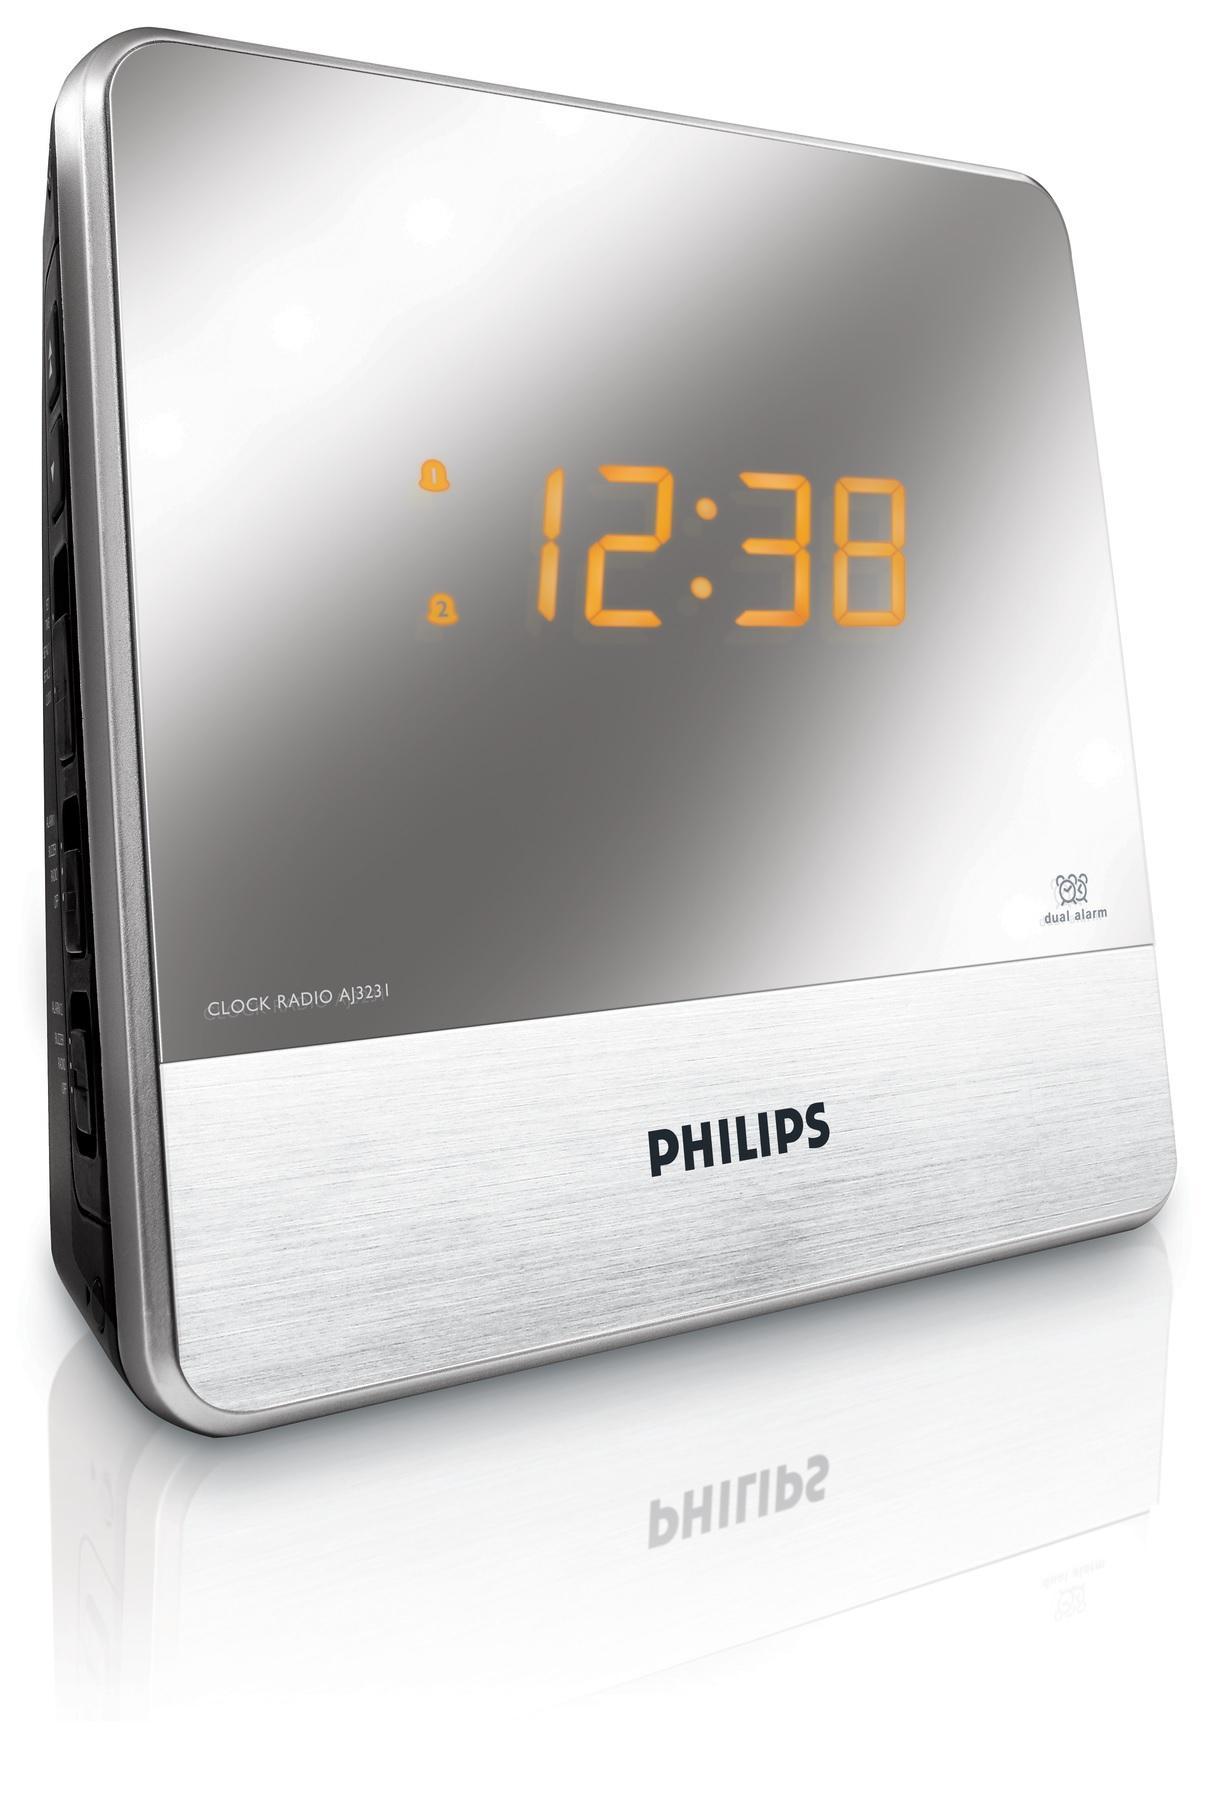 philips aj3231 05 clock radio mirror finish display tv. Black Bedroom Furniture Sets. Home Design Ideas